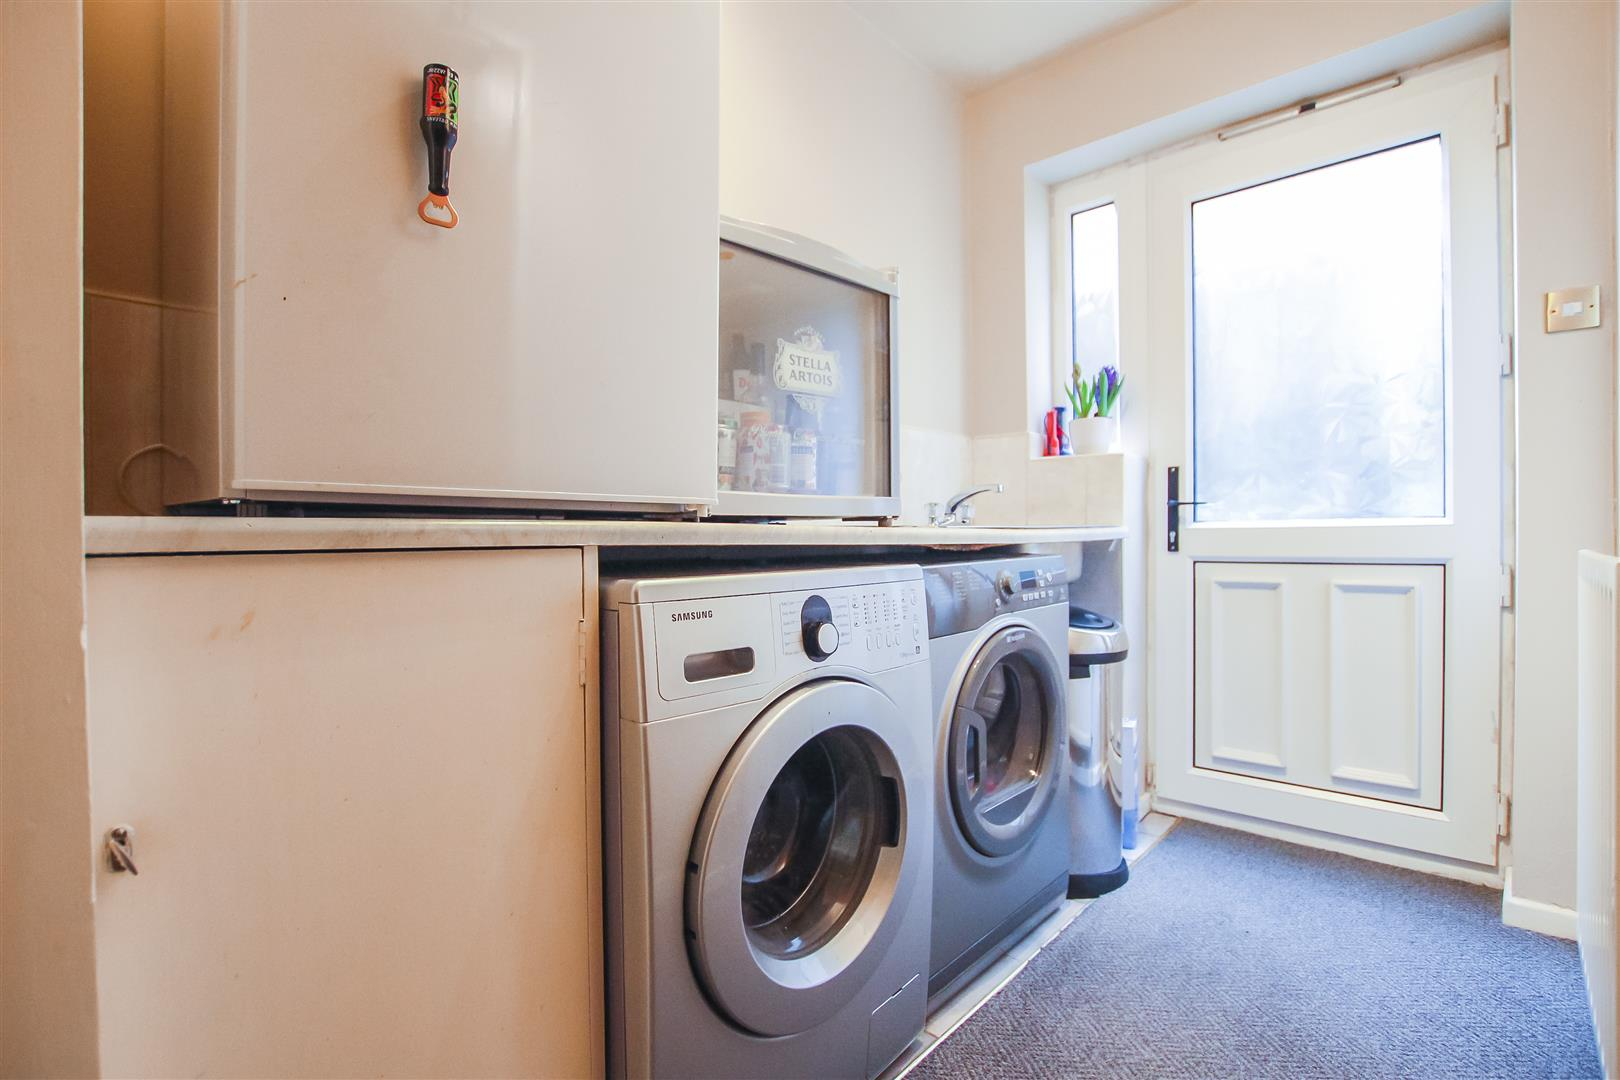 5 Bedroom Detached House For Sale - Utility Room